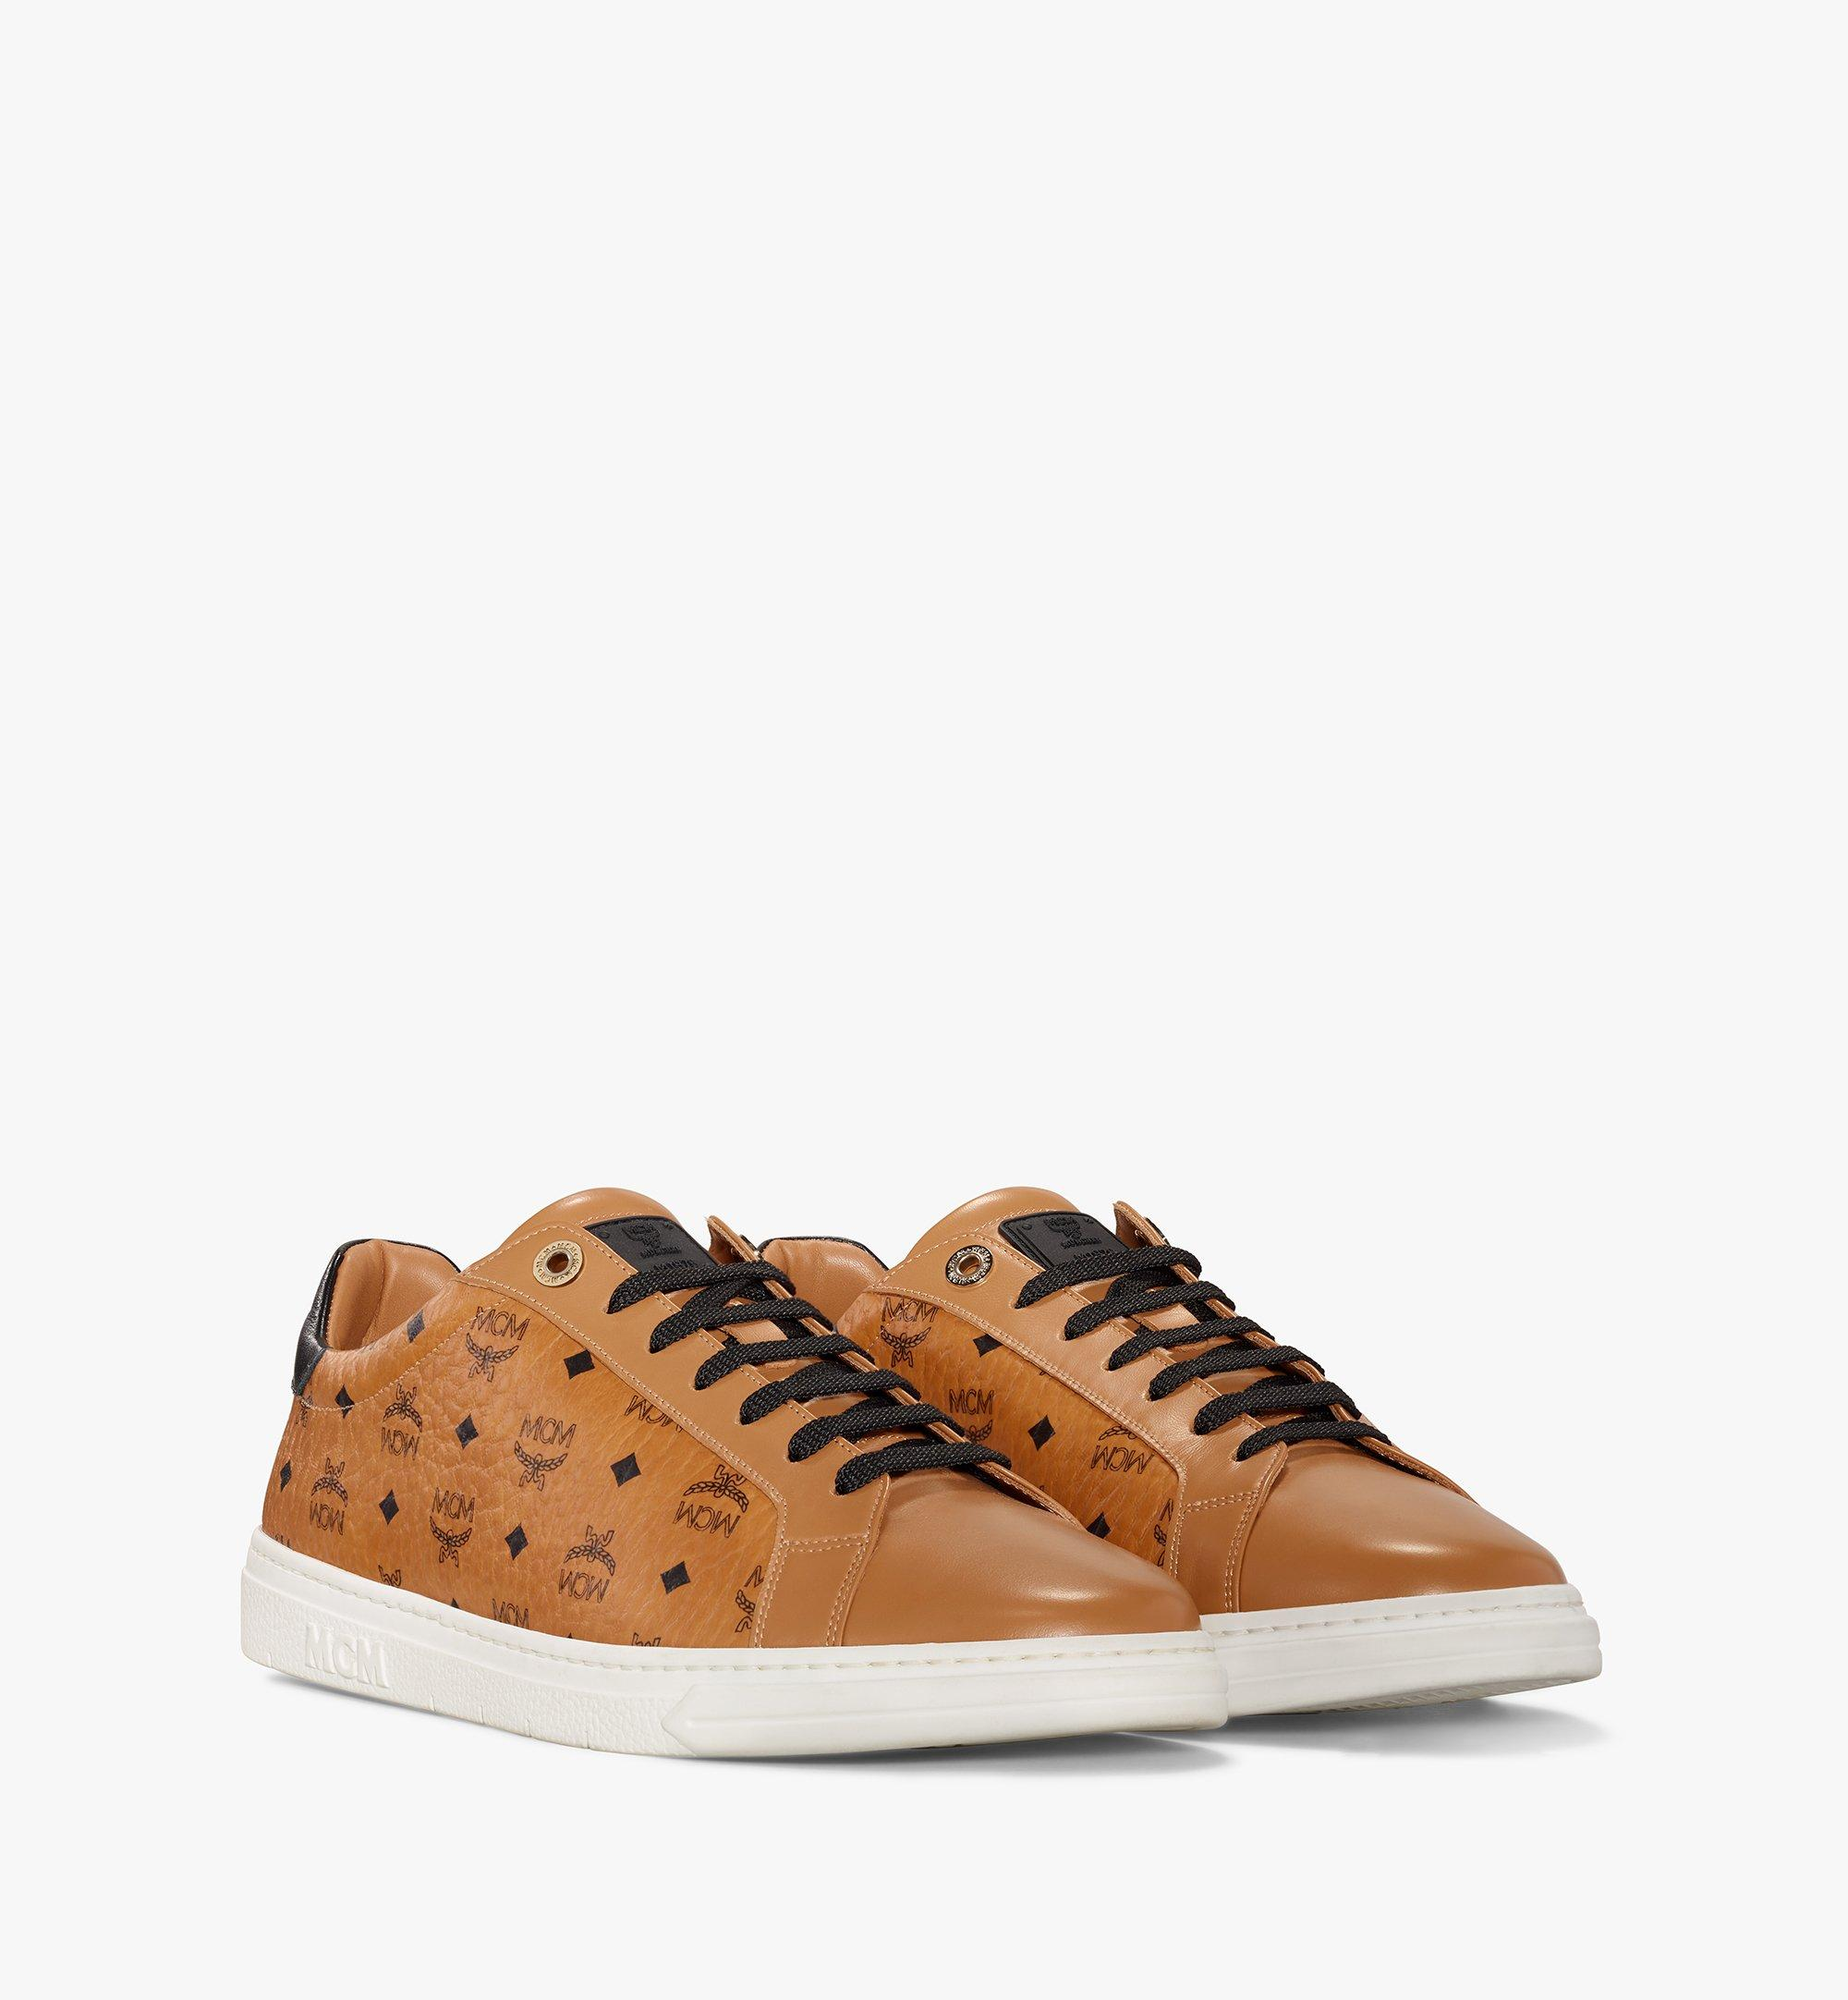 MCM Men's Terrain Lo Sneakers in Visetos Cognac MEXAAMM11CO042 มุมมองอื่น 1